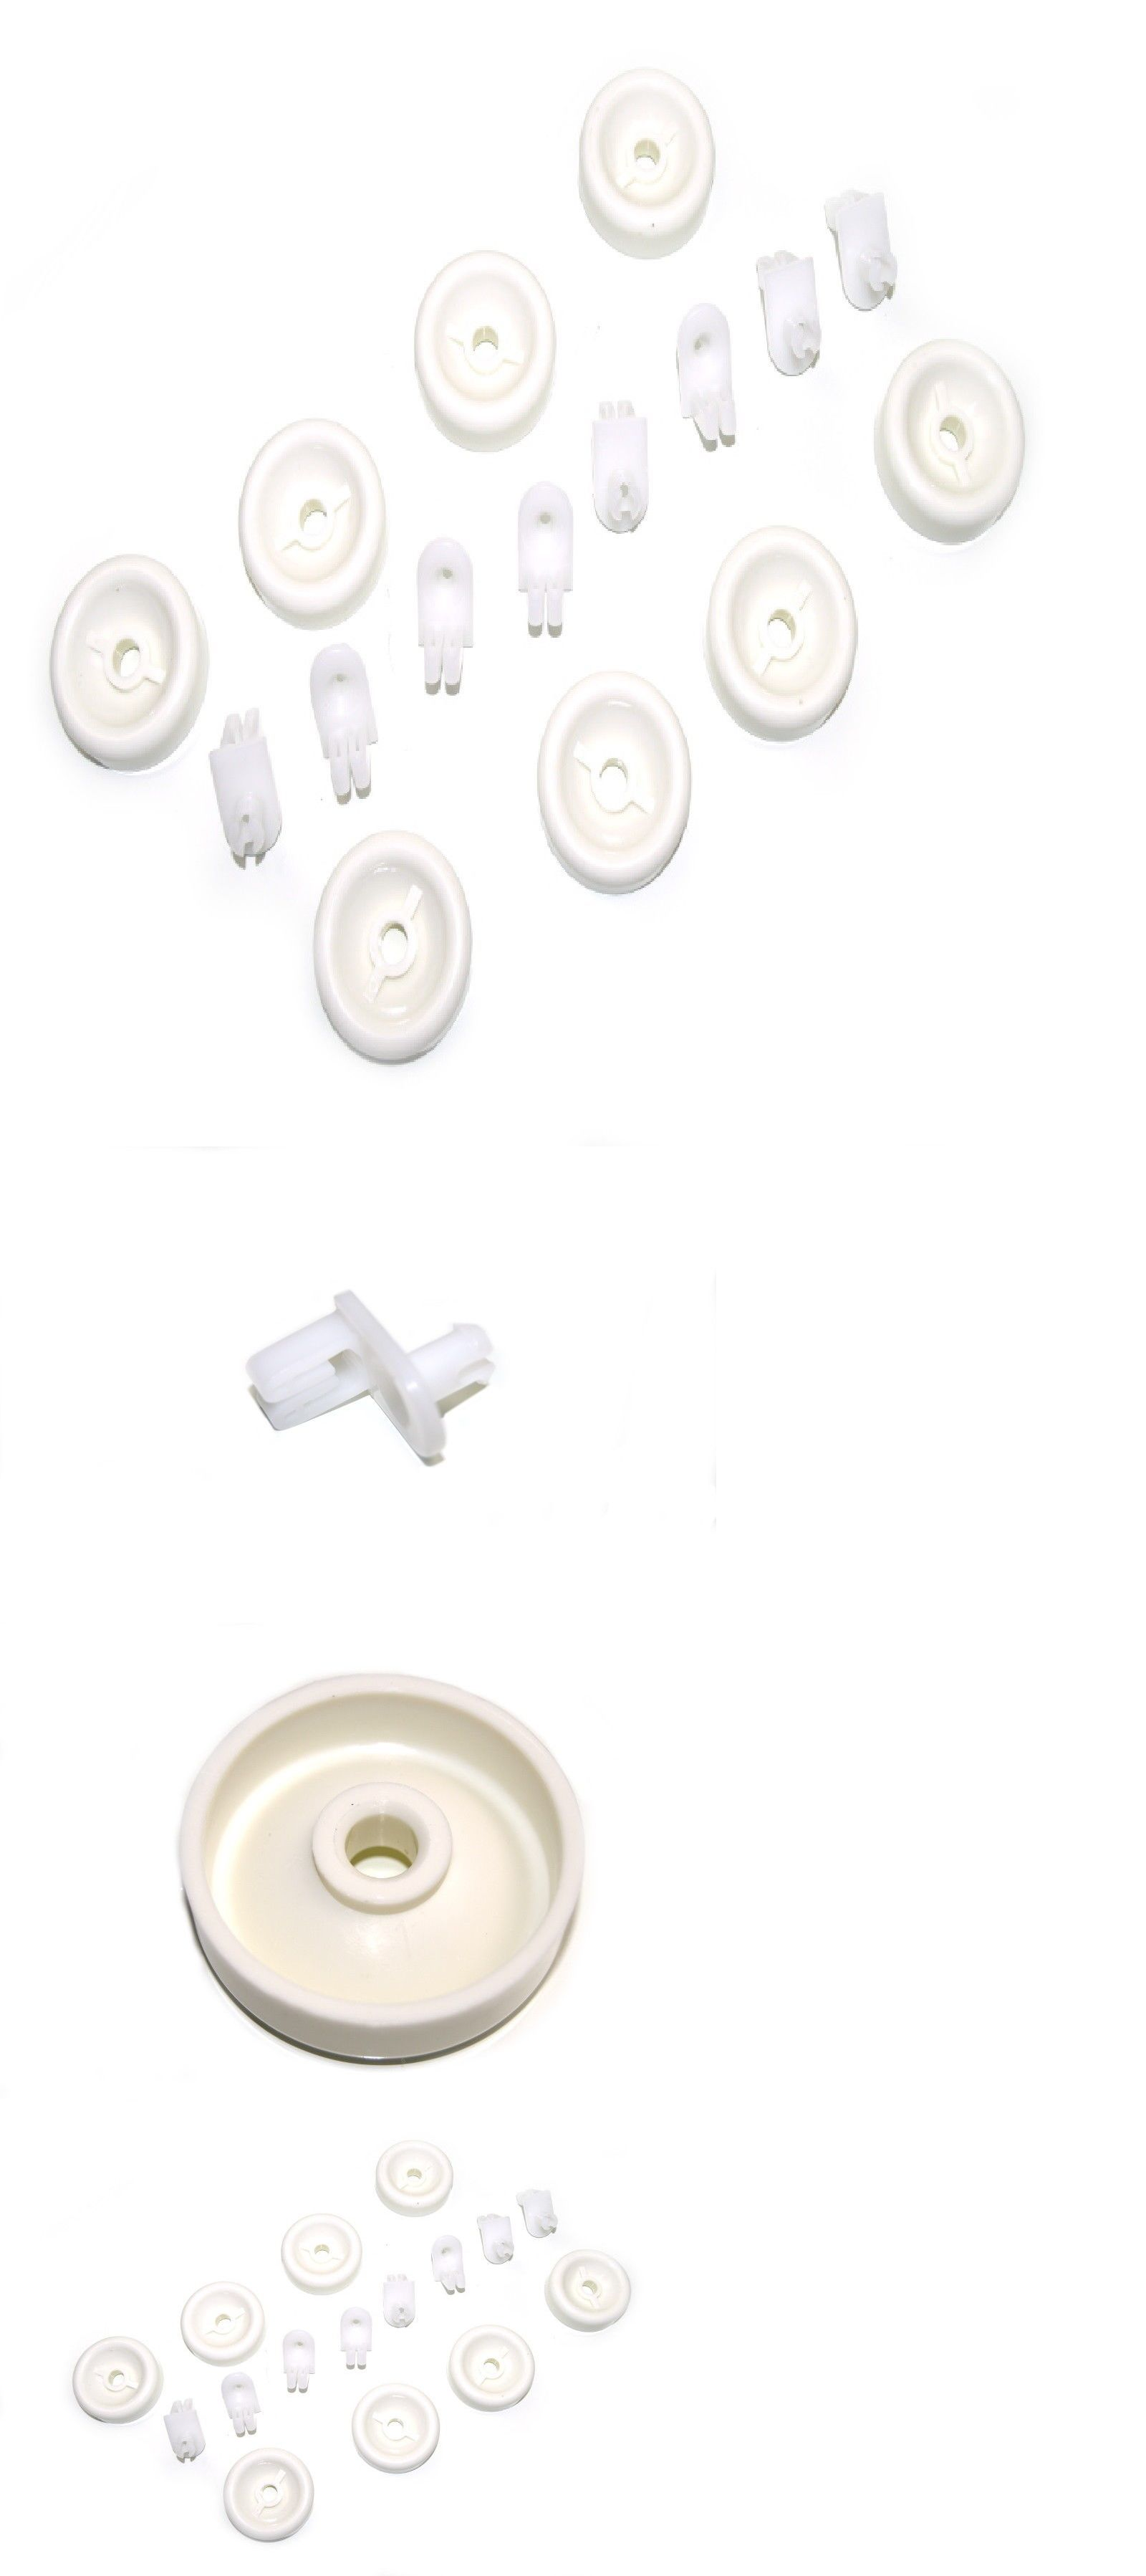 Wd35x21038 Dishwasher Rack Roller Wheels 8 Pack For Ge Frigidaire Dishwasher Ebay Frigidaire Dishwasher Dishwasher Racks Dishwasher Parts